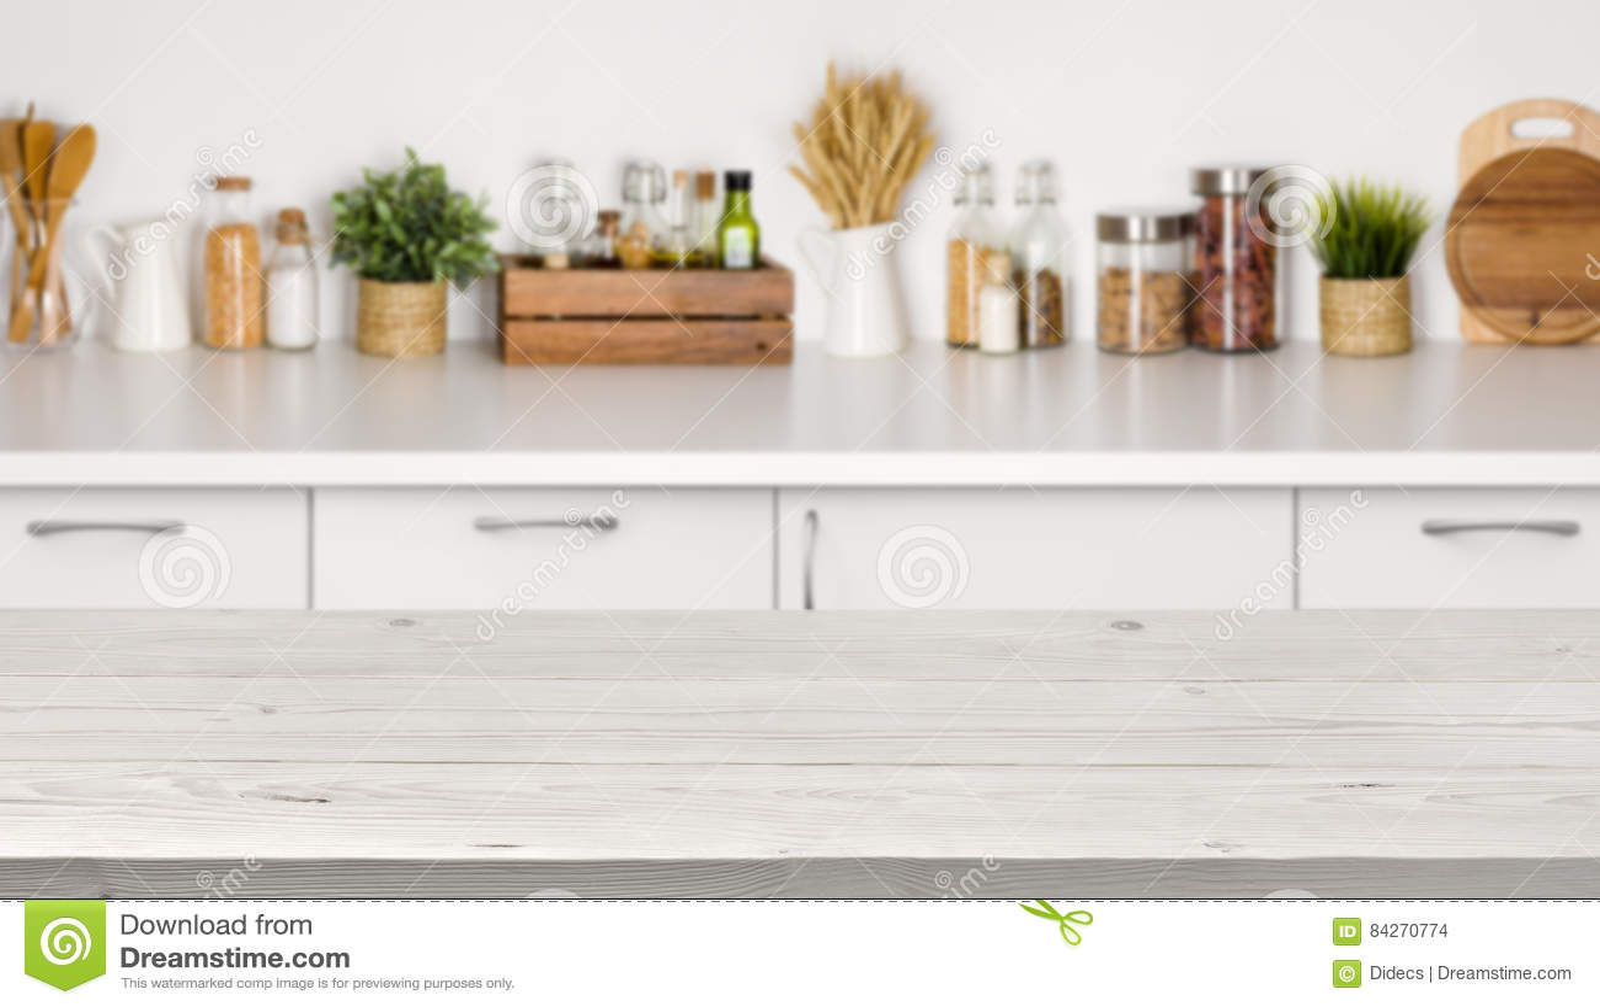 kitchen banquettes for sale maple cabinets 长凳储蓄图象 下载300 622皇族释放照片 倒空与厨房长凳内部的bokeh图象的木桌库存图片